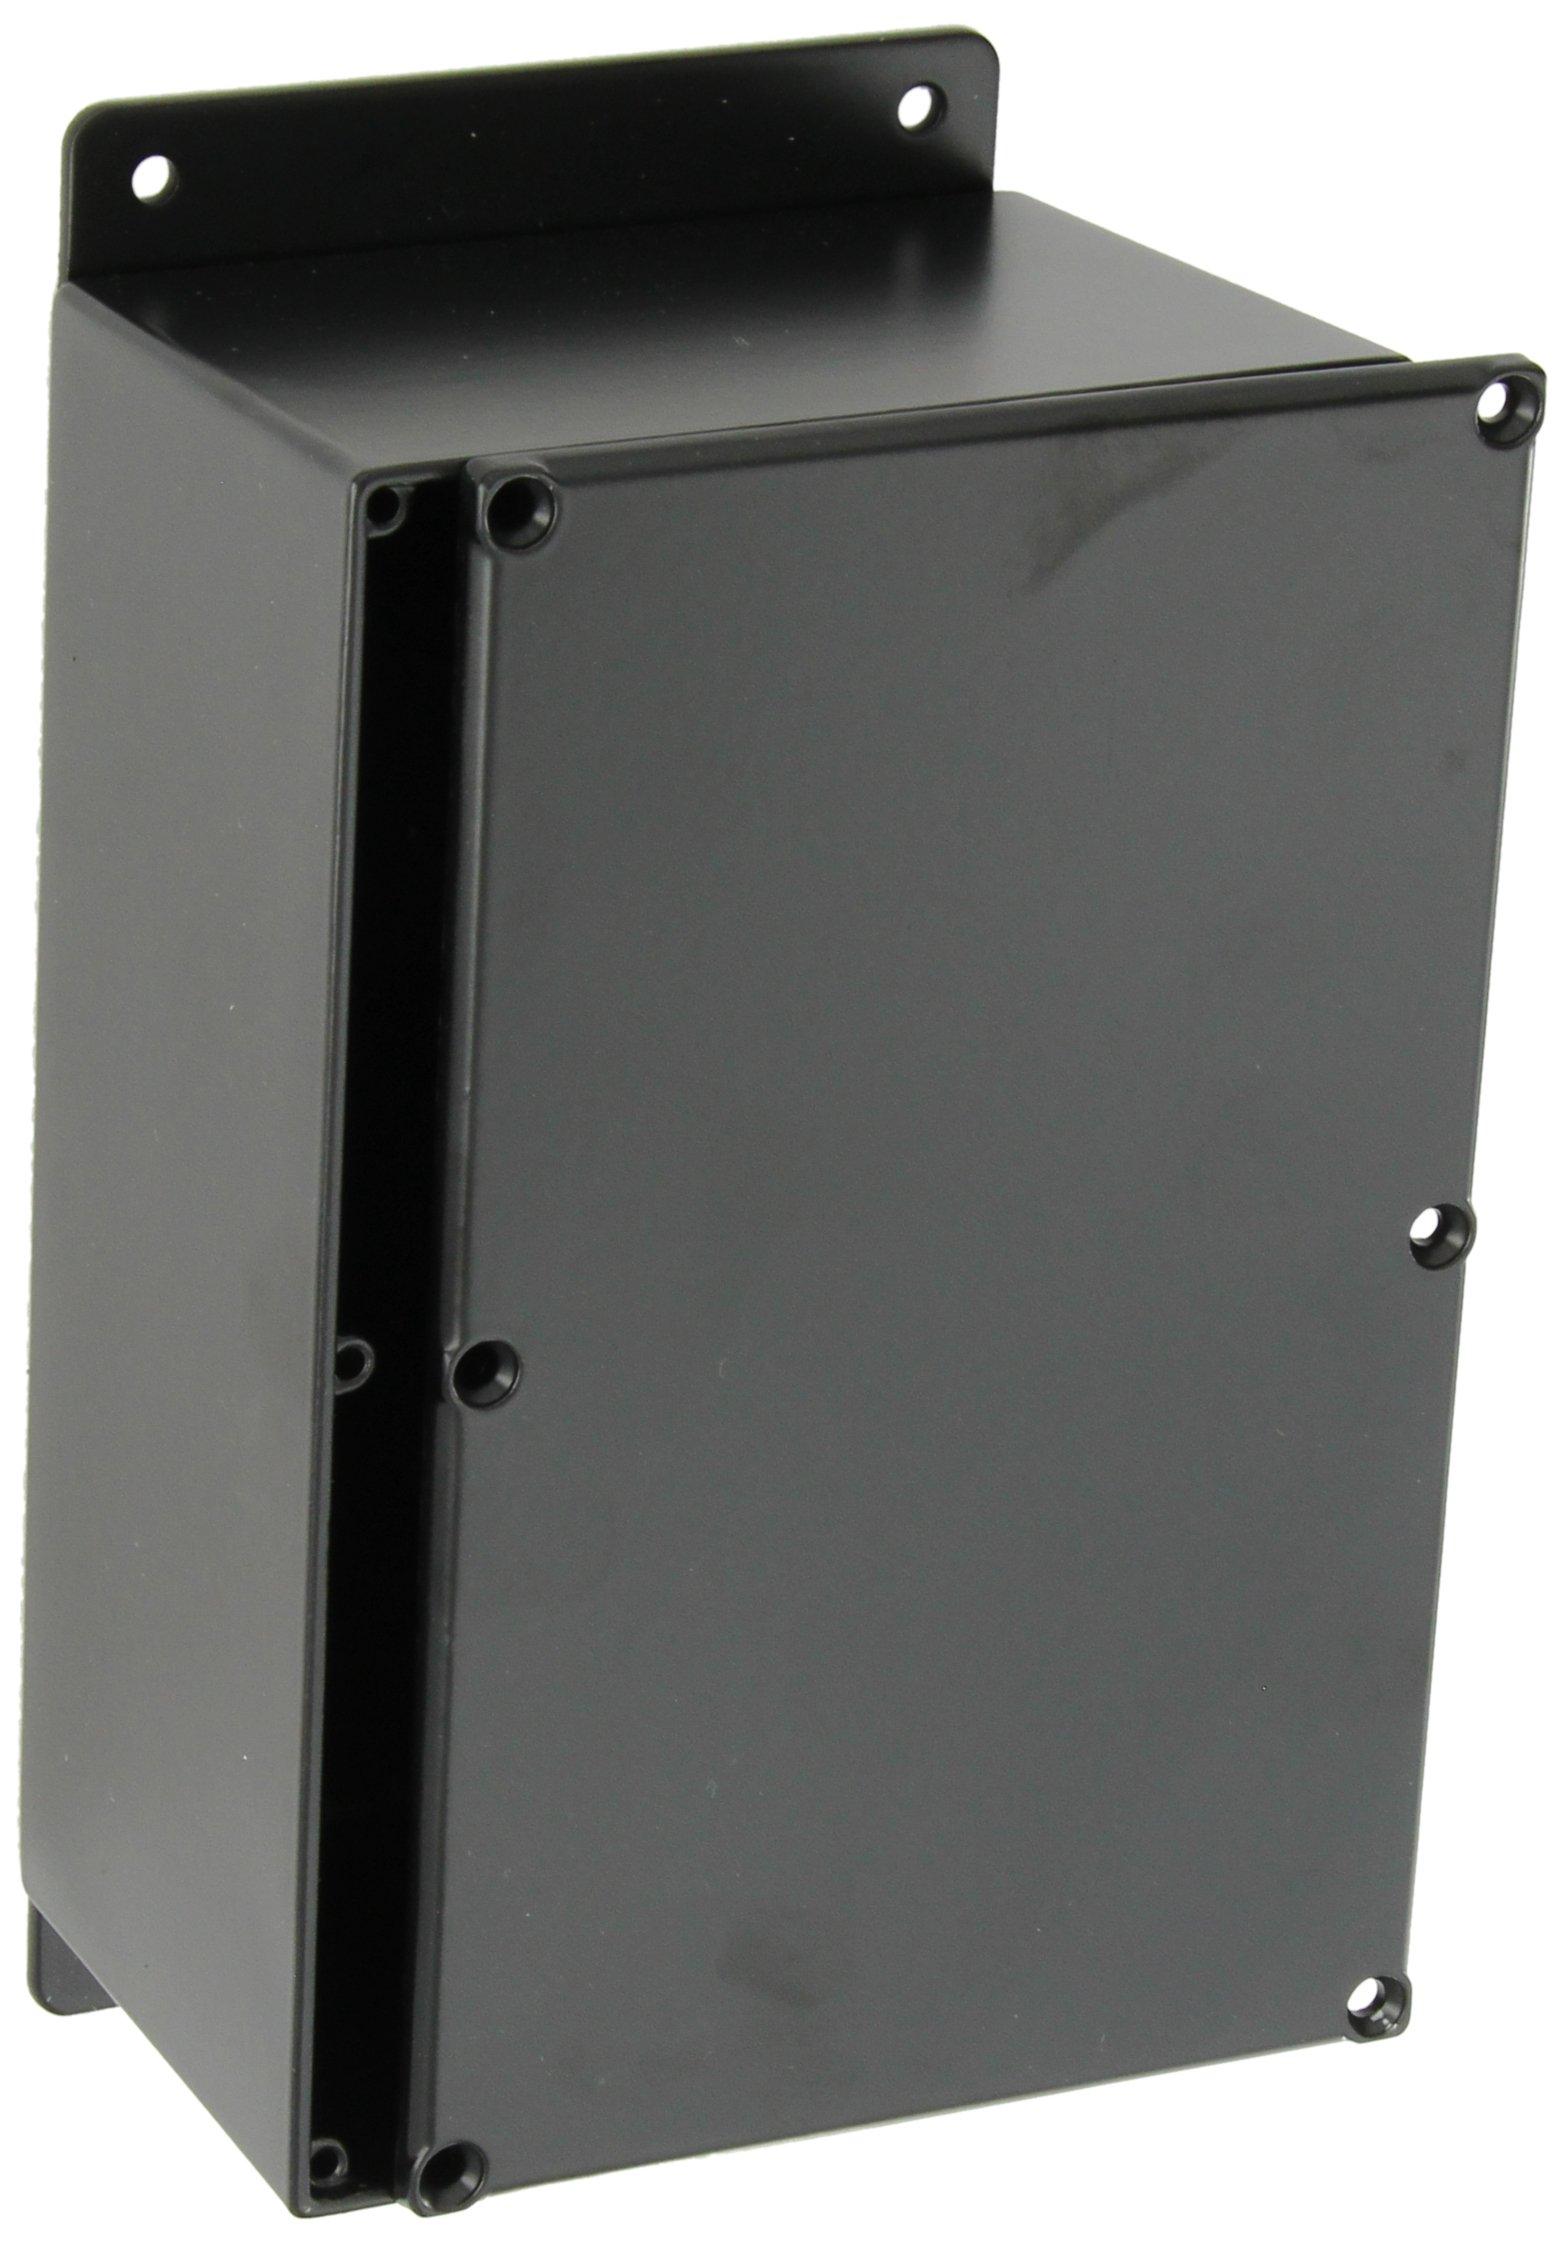 BUD Industries CU-4347-B Die Cast Aluminum Econobox with Mounting Bracket, 7-3/8'' Length x 4-11/16'' Width x 3-13/64'' Height, Black Powdercoat Finish